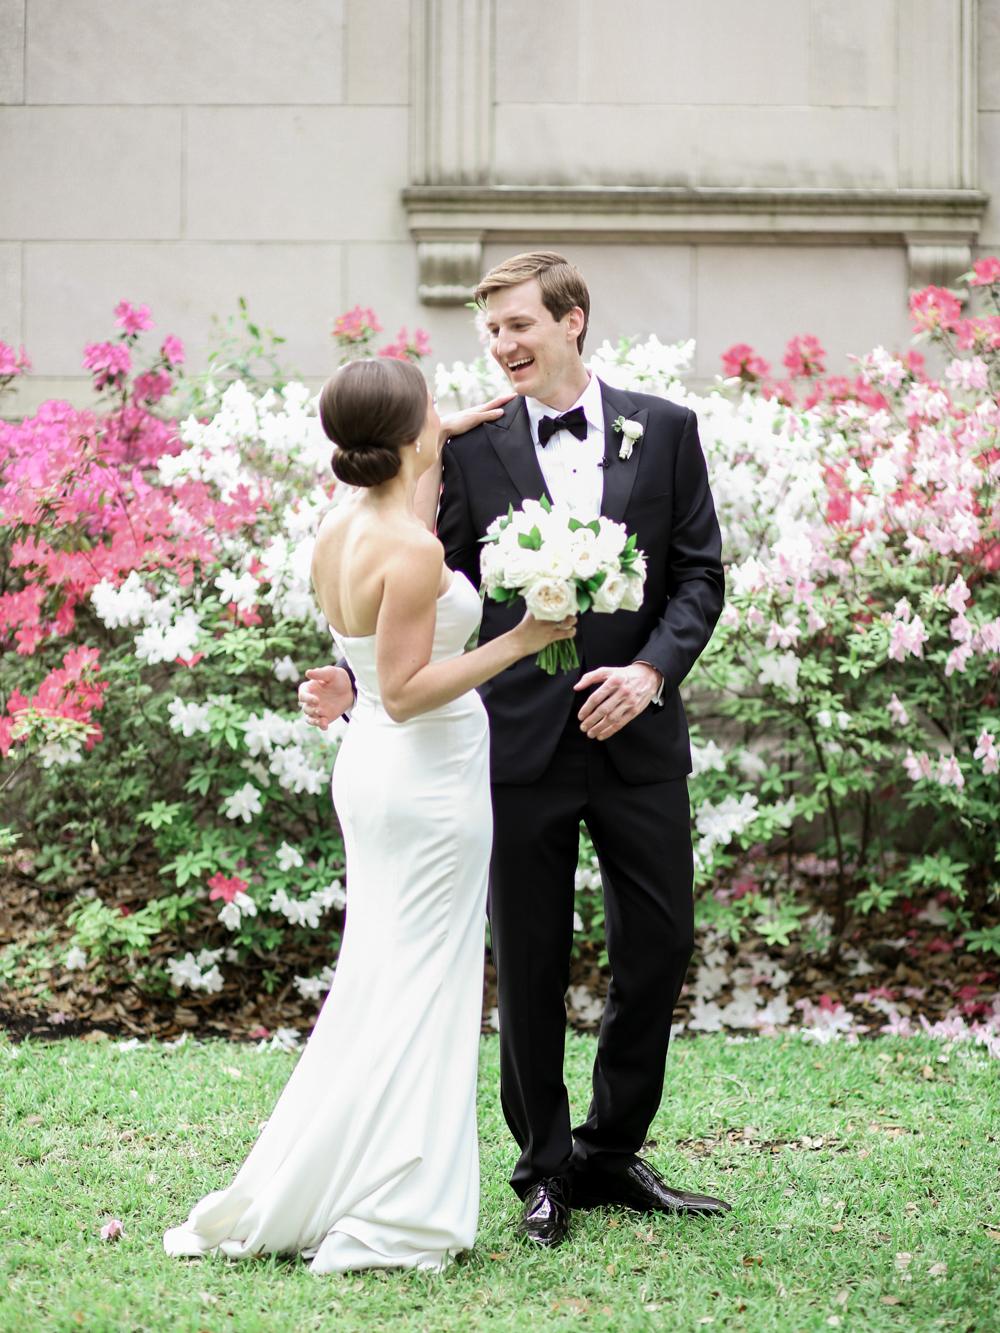 benefits of a first look_wedding photography_wedding photographer_film wedding photographer_Christine Gosch_www.christinegosch.com_Houston, Texas wedding photographer_ Houston, Texas-6.jpg